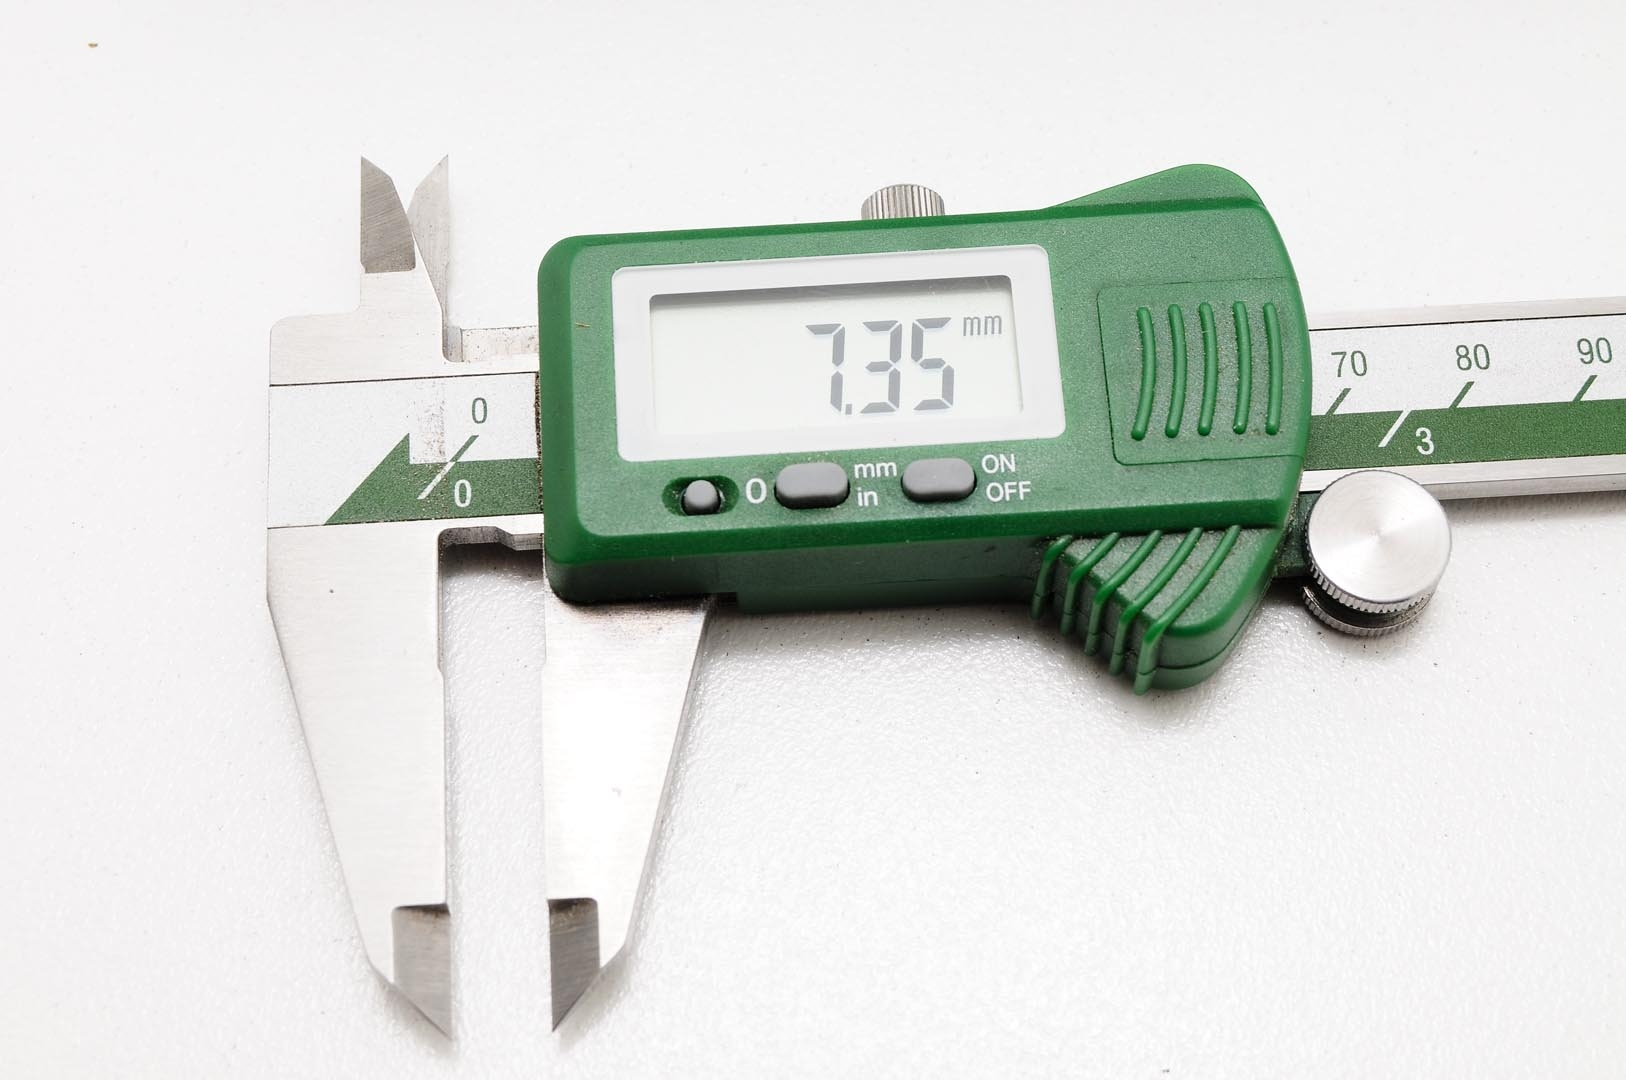 1112-150-Pie de rey, calibrador Digital 0-150mm 1112-150-max-2.